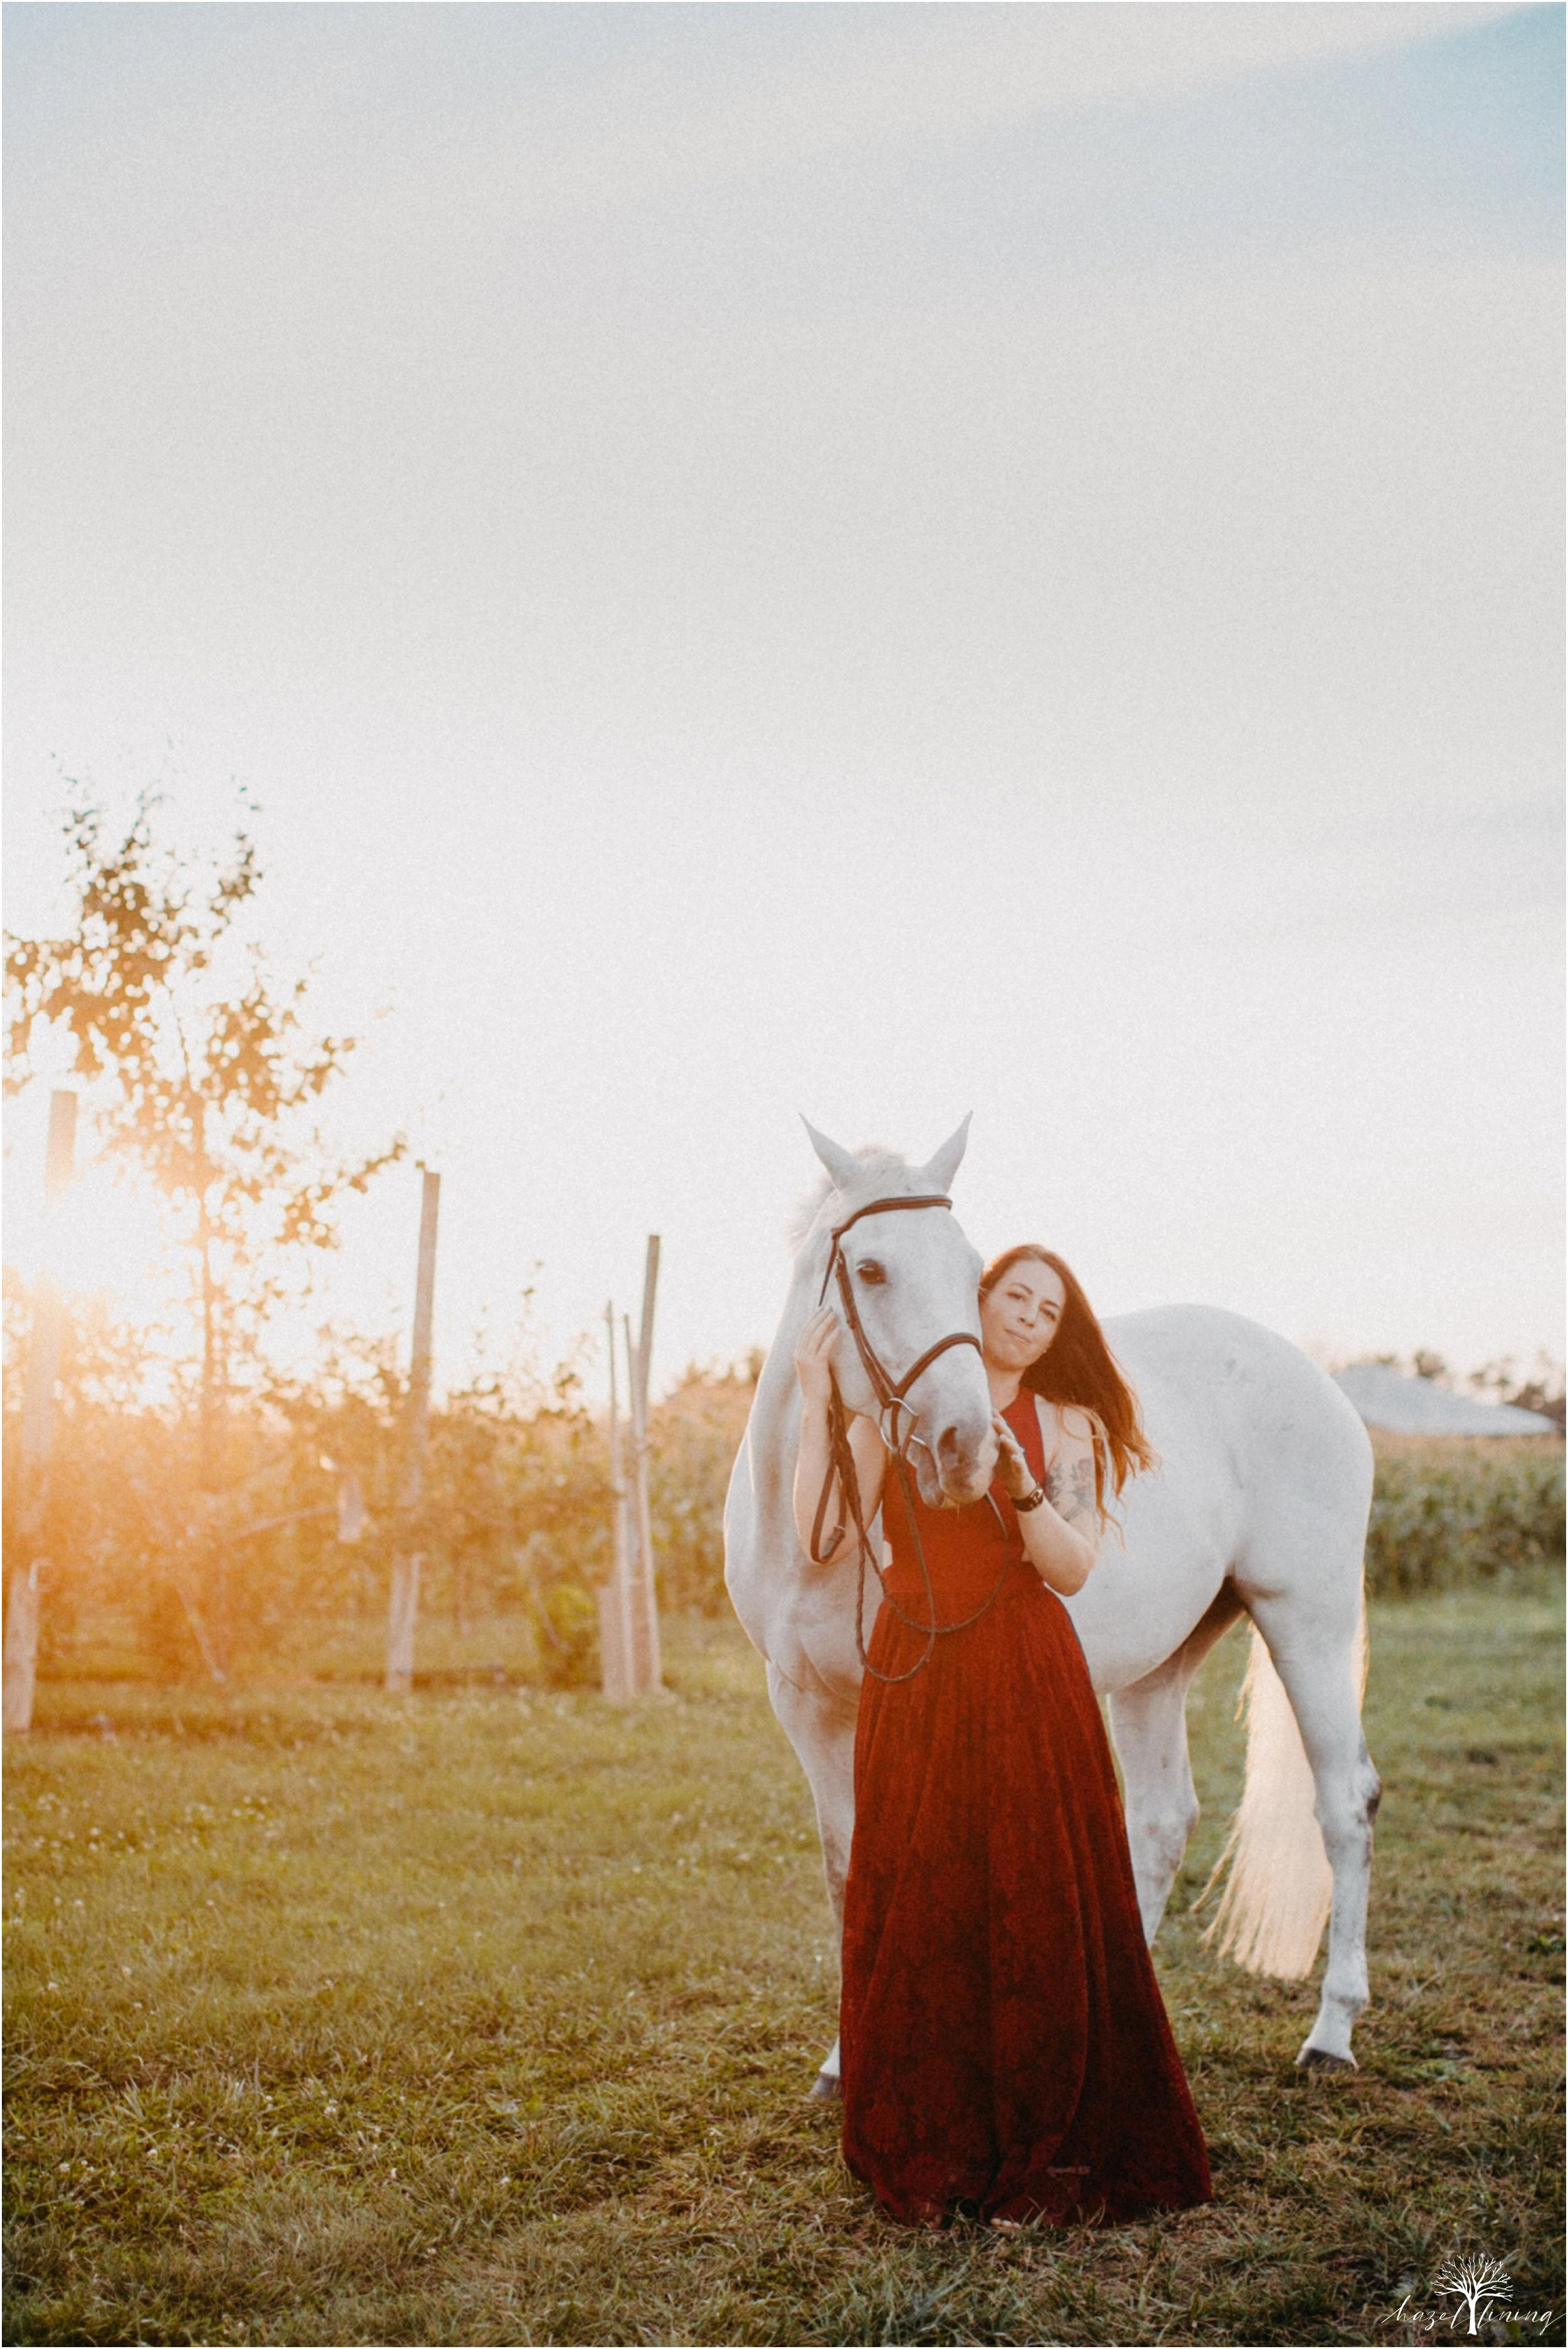 taylor-adams-and-horse-delaware-valley-university-delval-summer-equestrian-portrait-session-hazel-lining-photography-destination-elopement-wedding-engagement-photography_0066.jpg